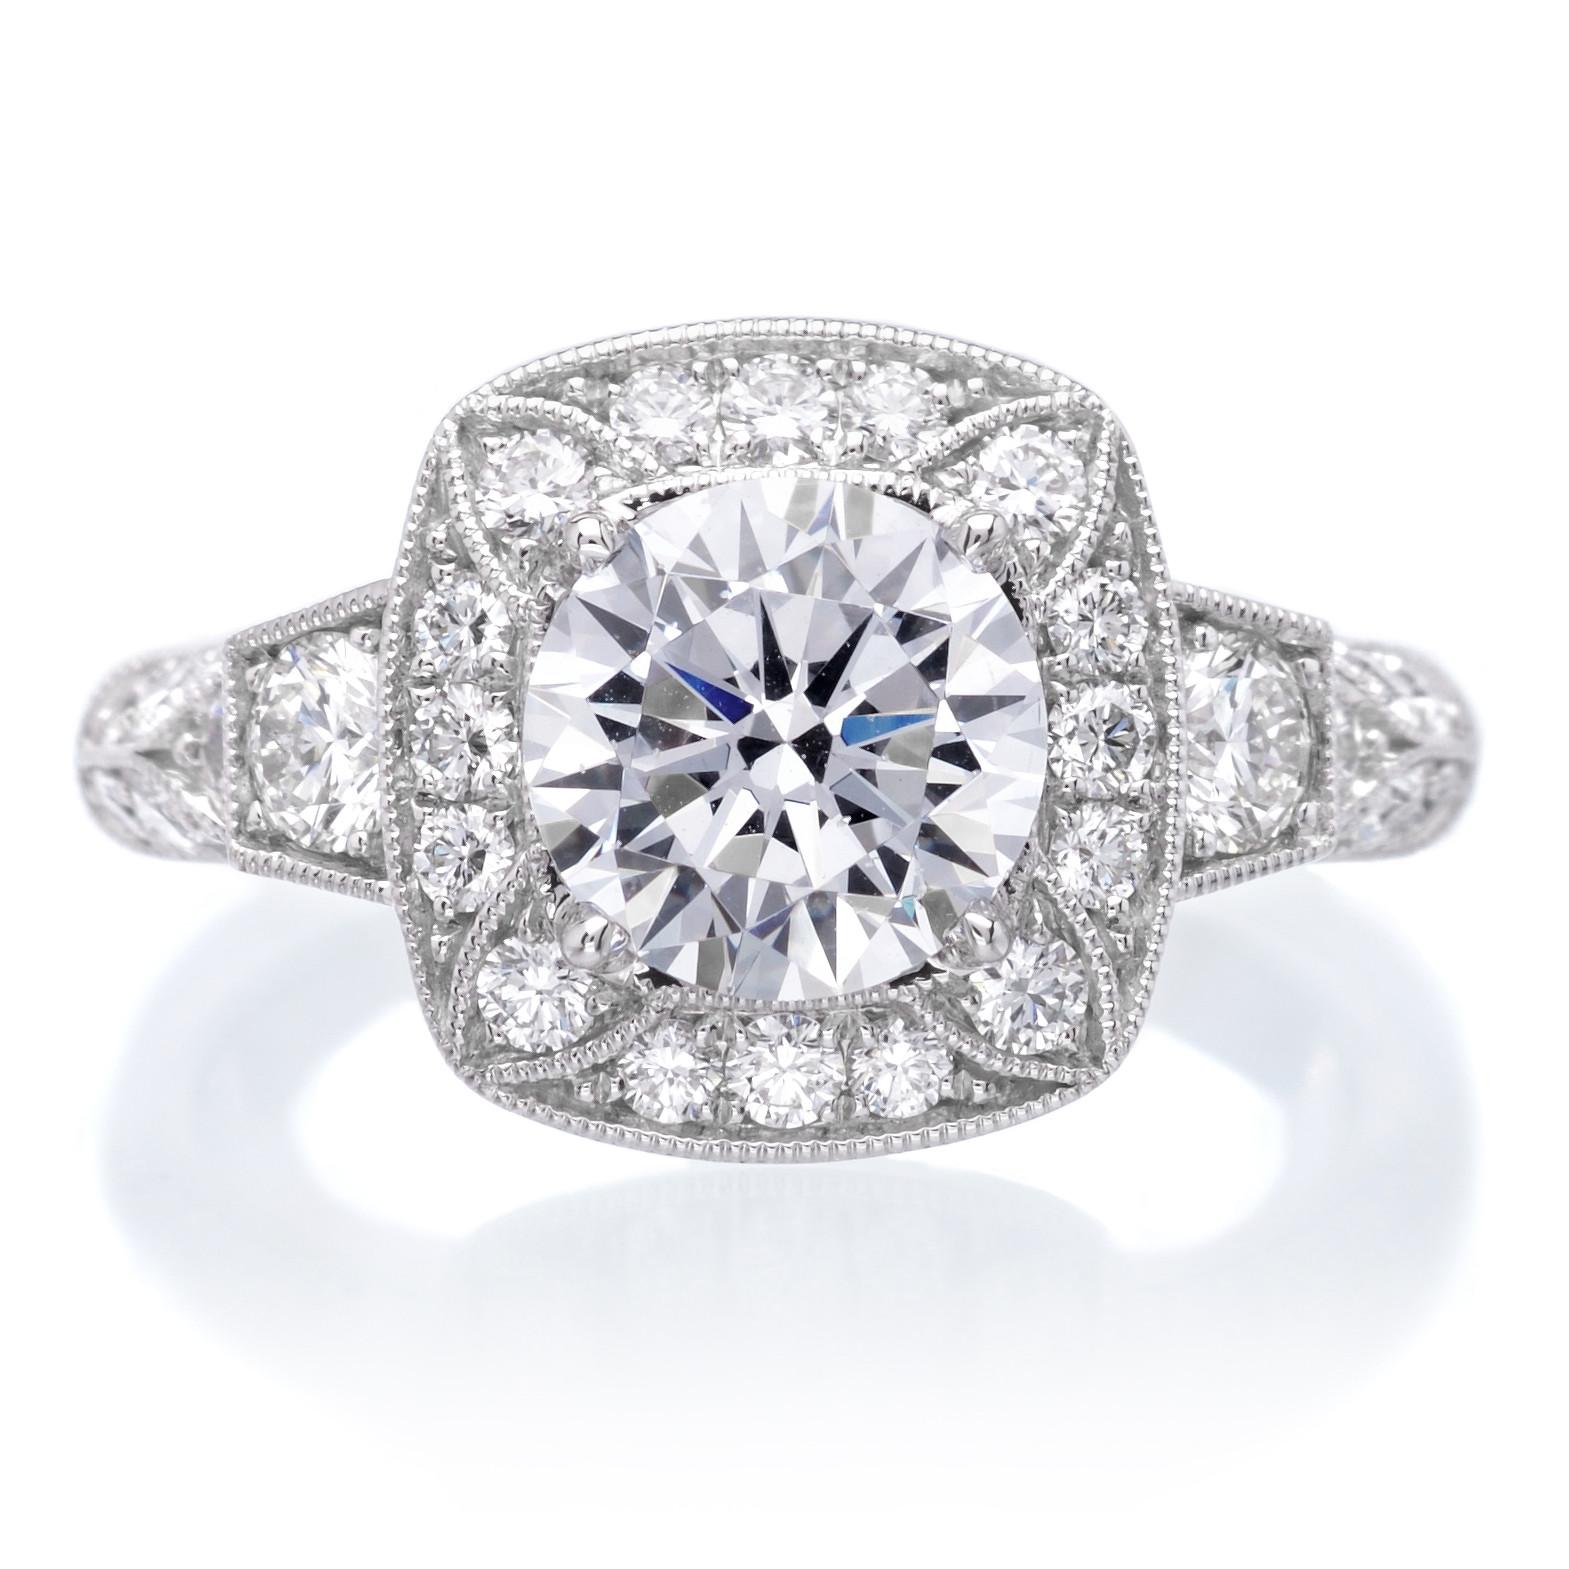 Sylvie 18K White Gold Designer Cushion Halo Diamond Engagement Ring